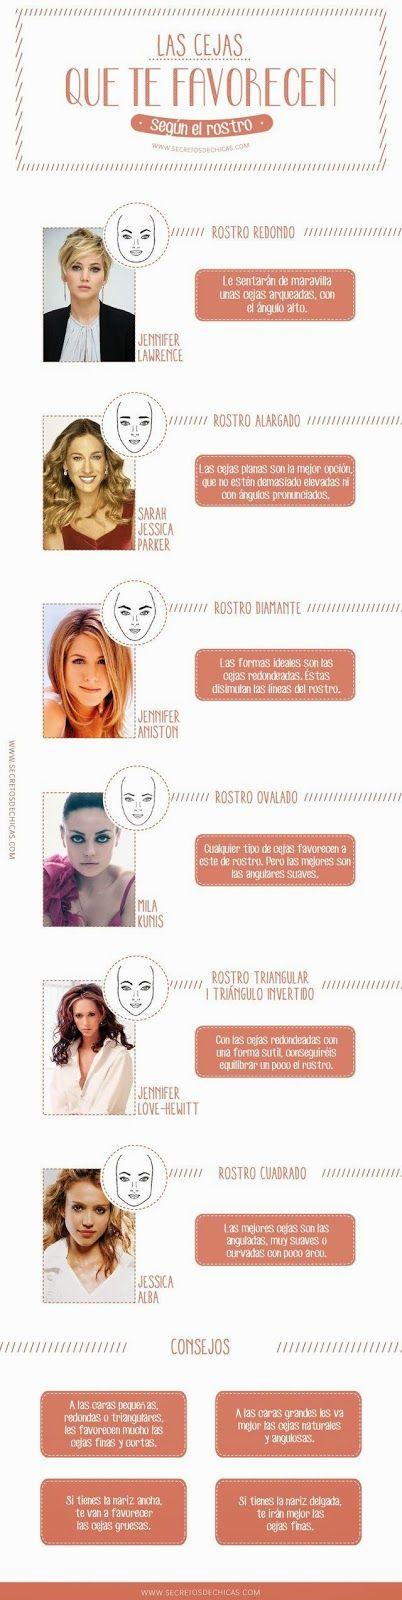 #Cejas segun la forma de tu rostro